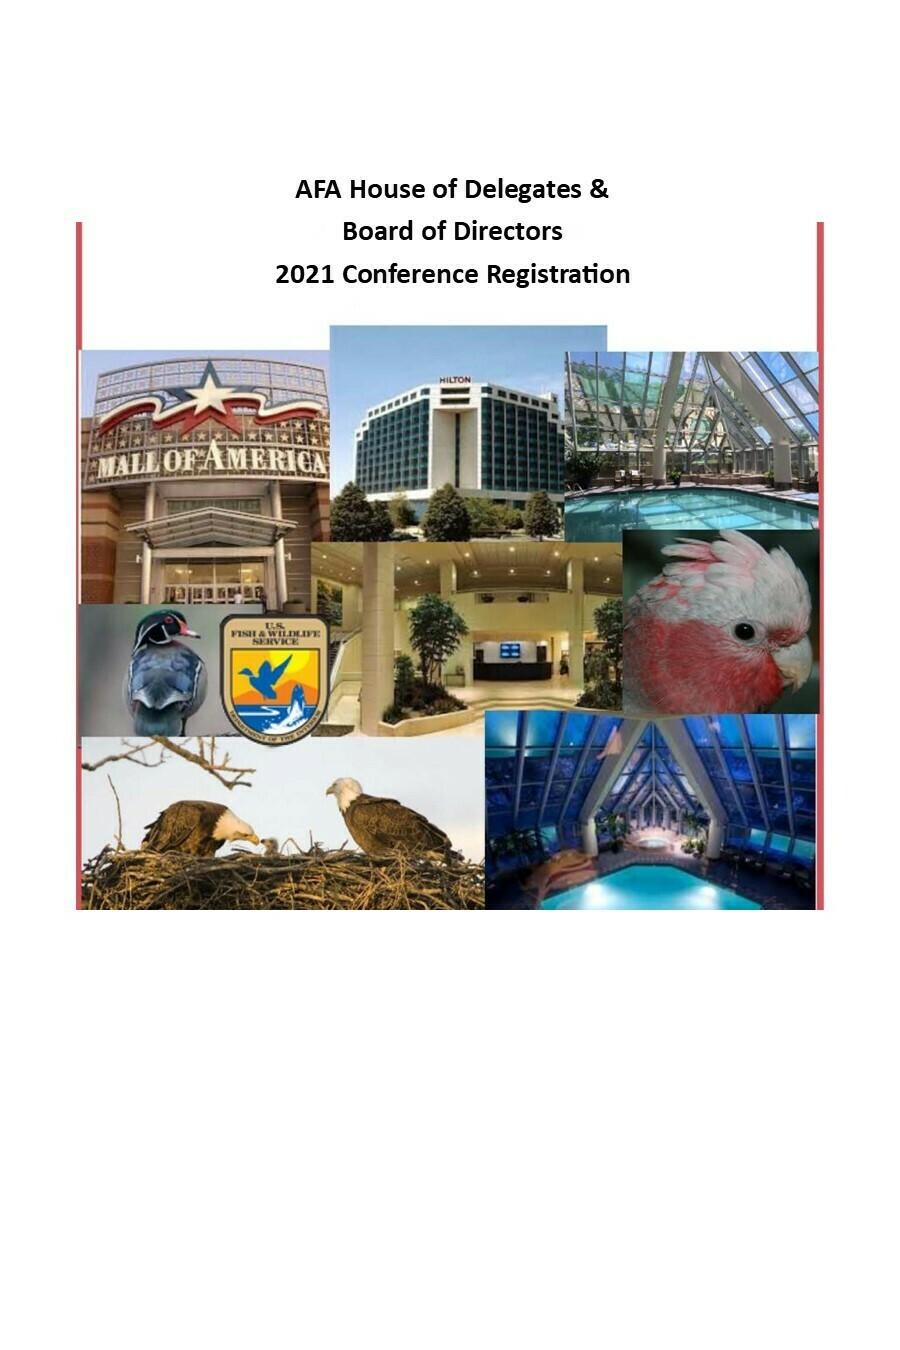 House of Delegates 3 Day Conference Registration